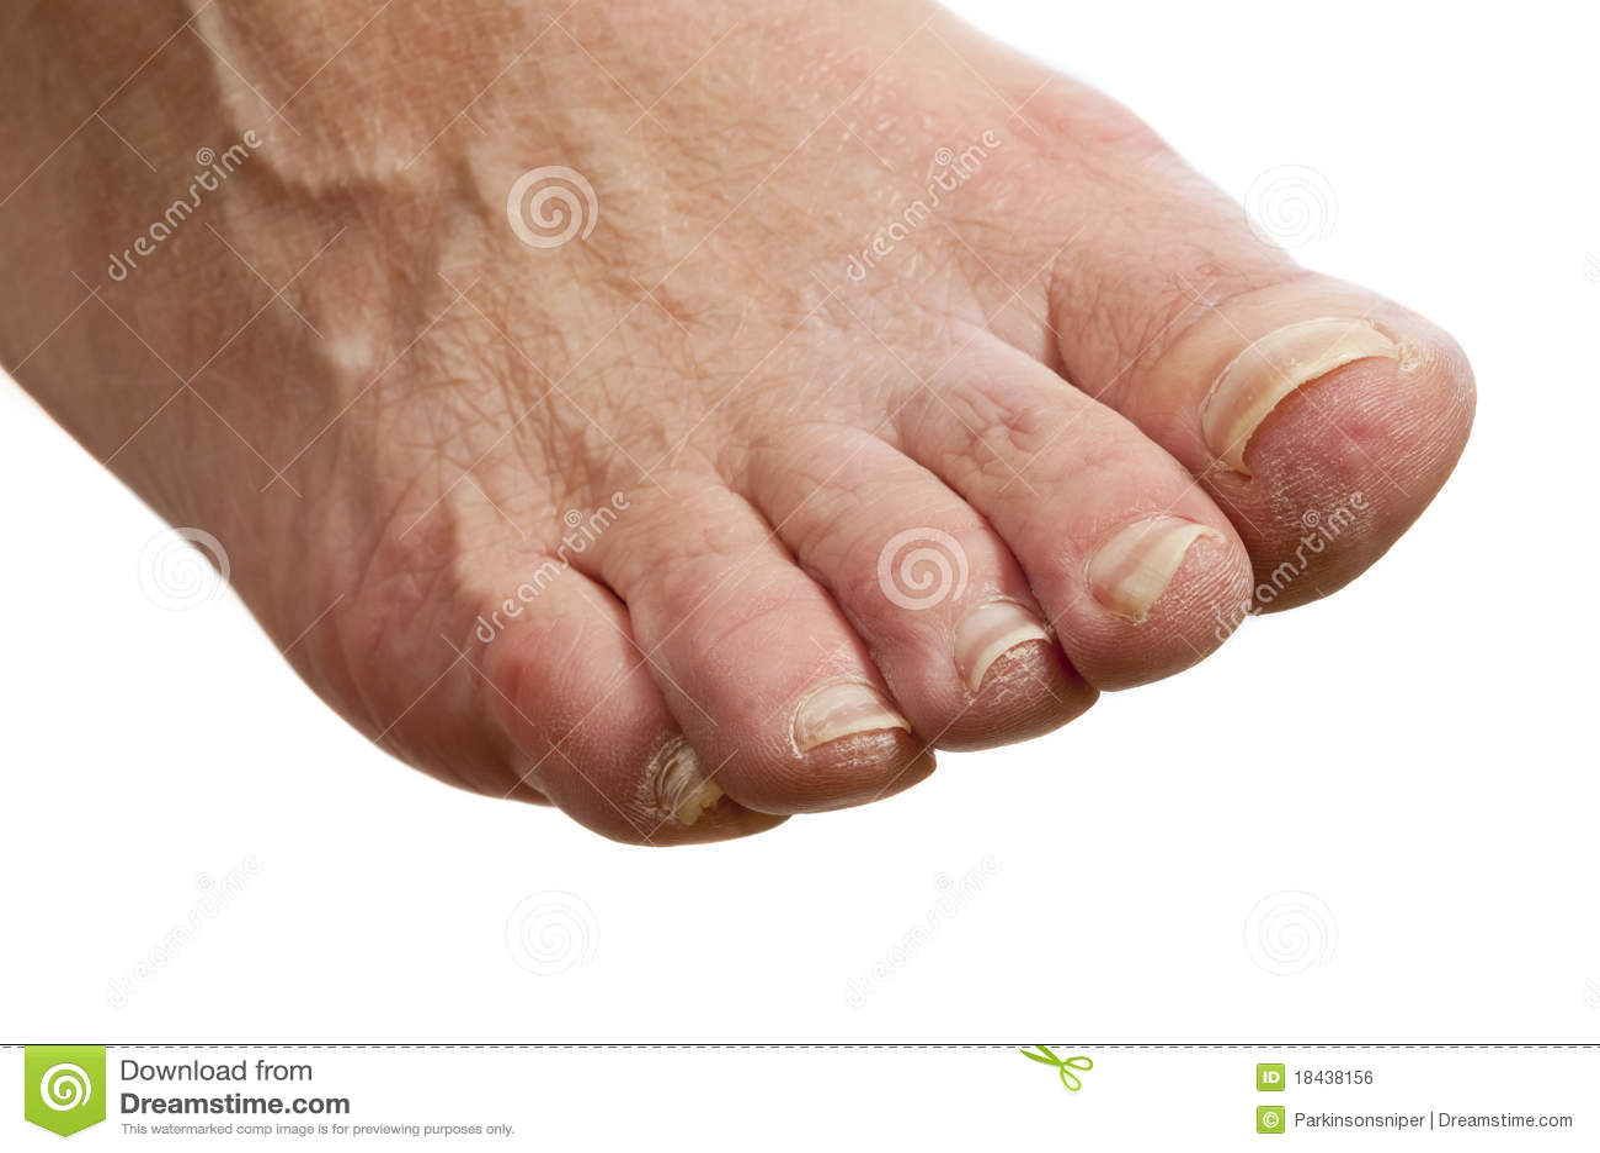 Unhealty uncared ногой